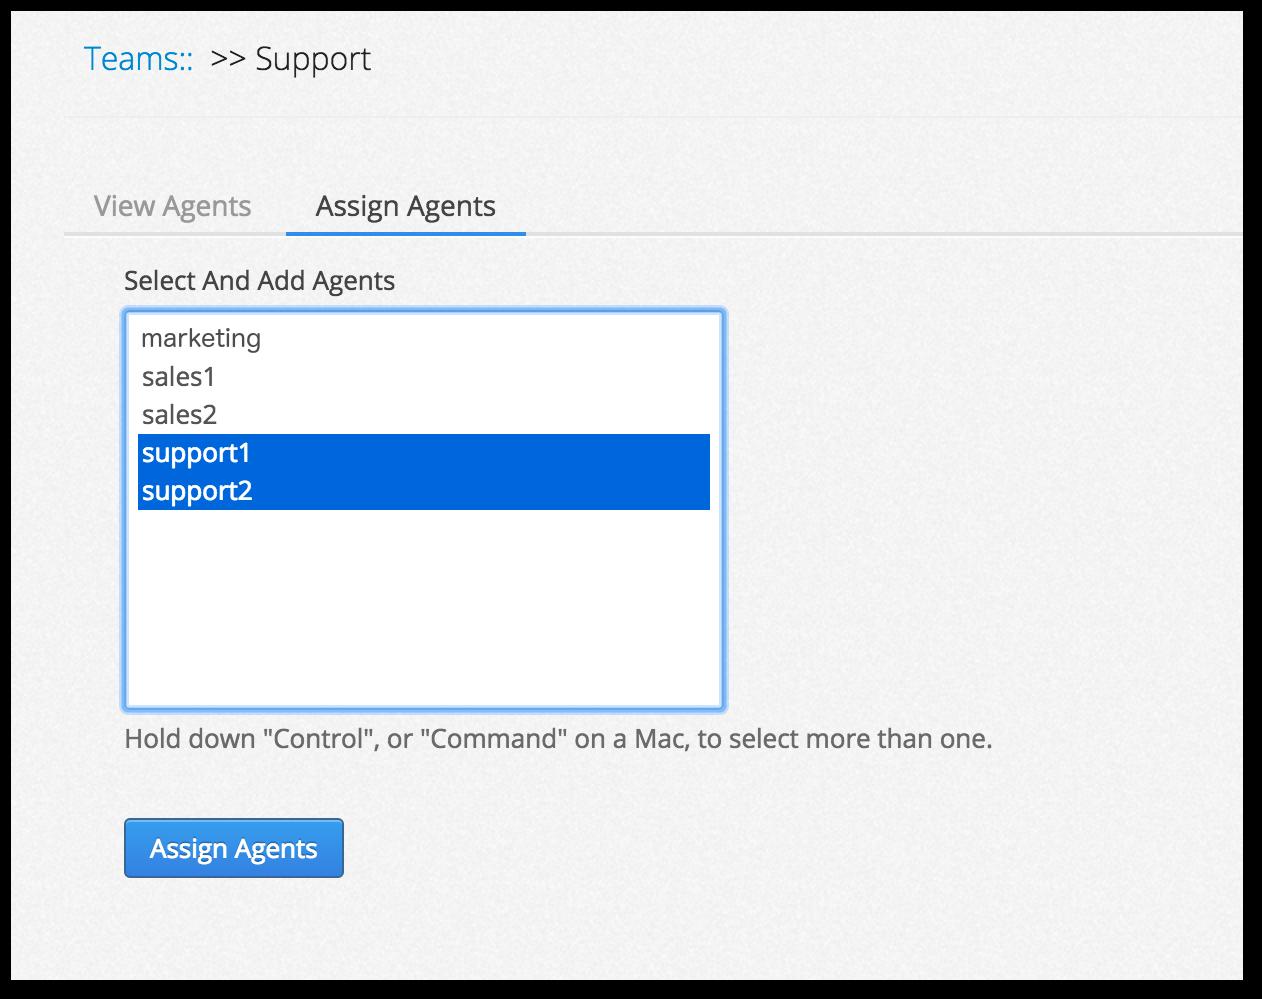 assign-agents-teams